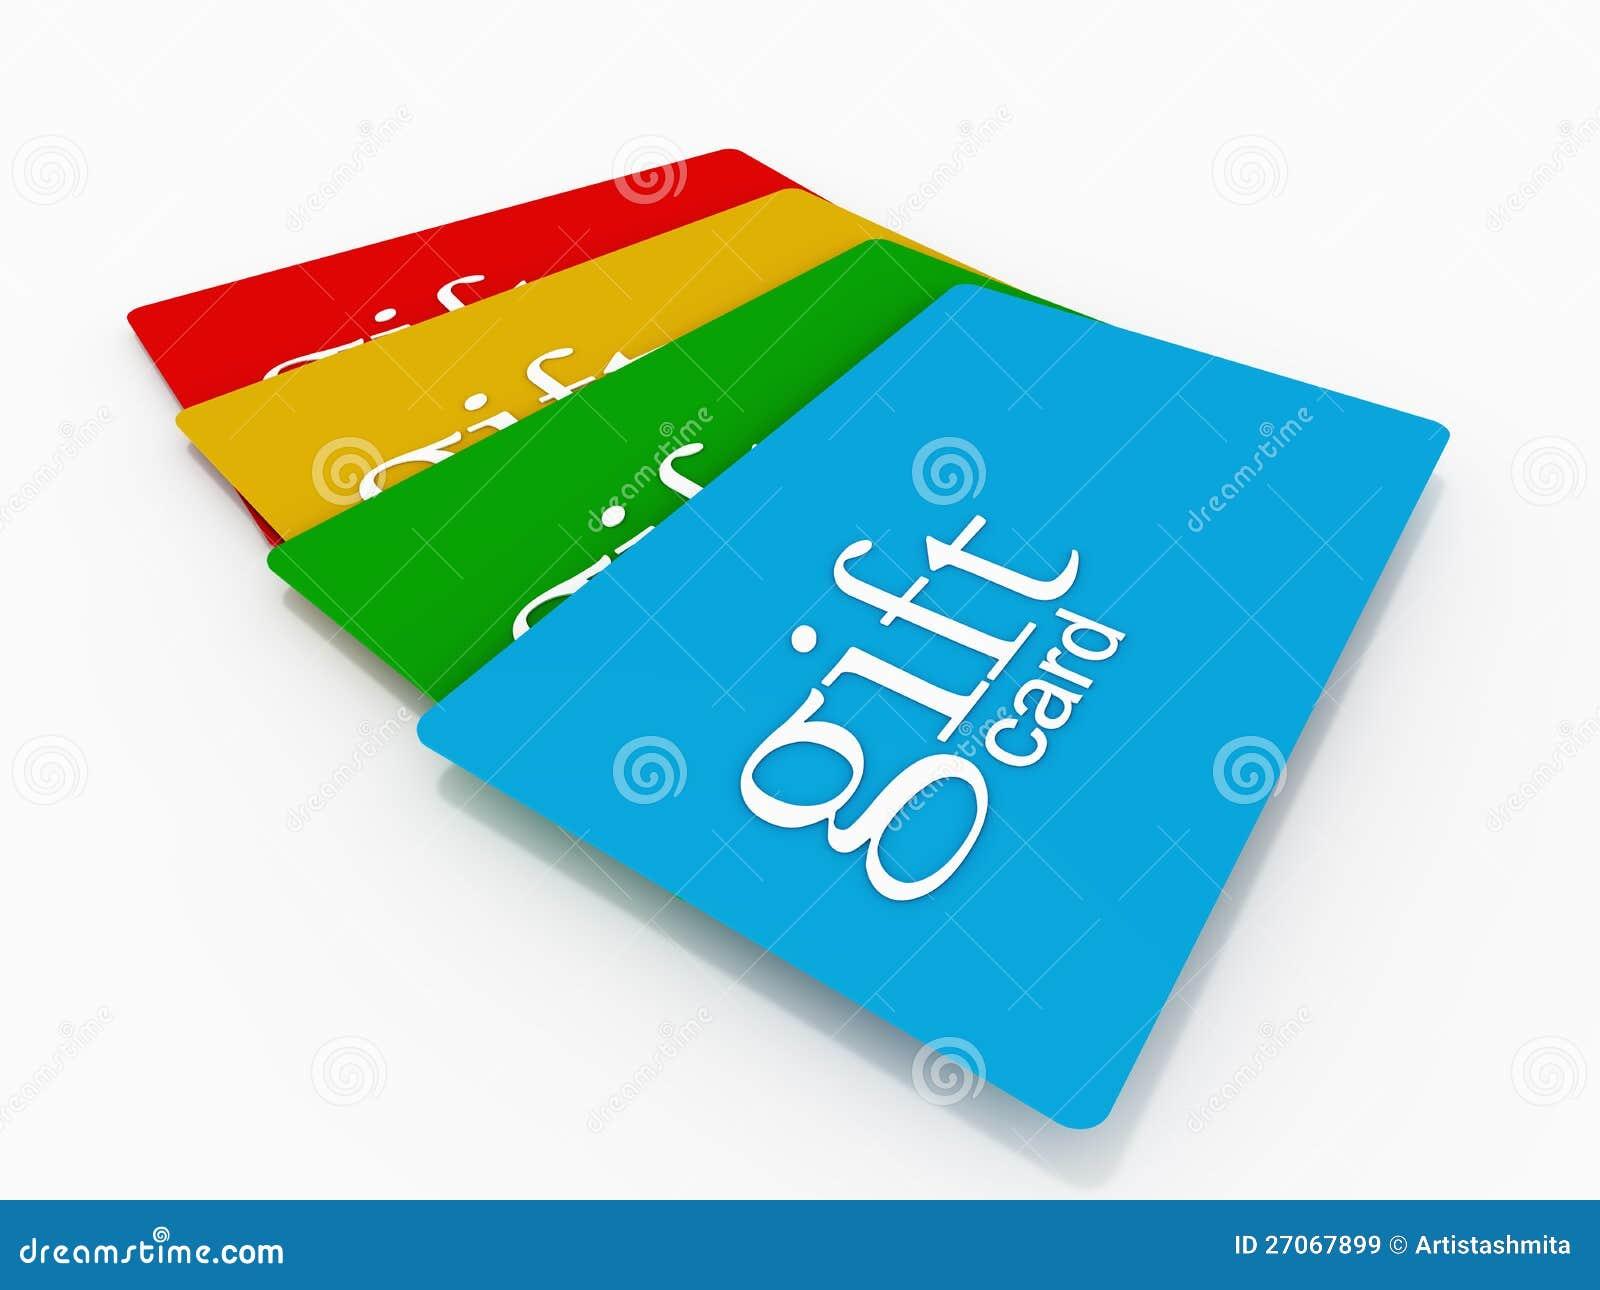 Gift certificate clipart free idealstalist gift certificate clipart free negle Choice Image